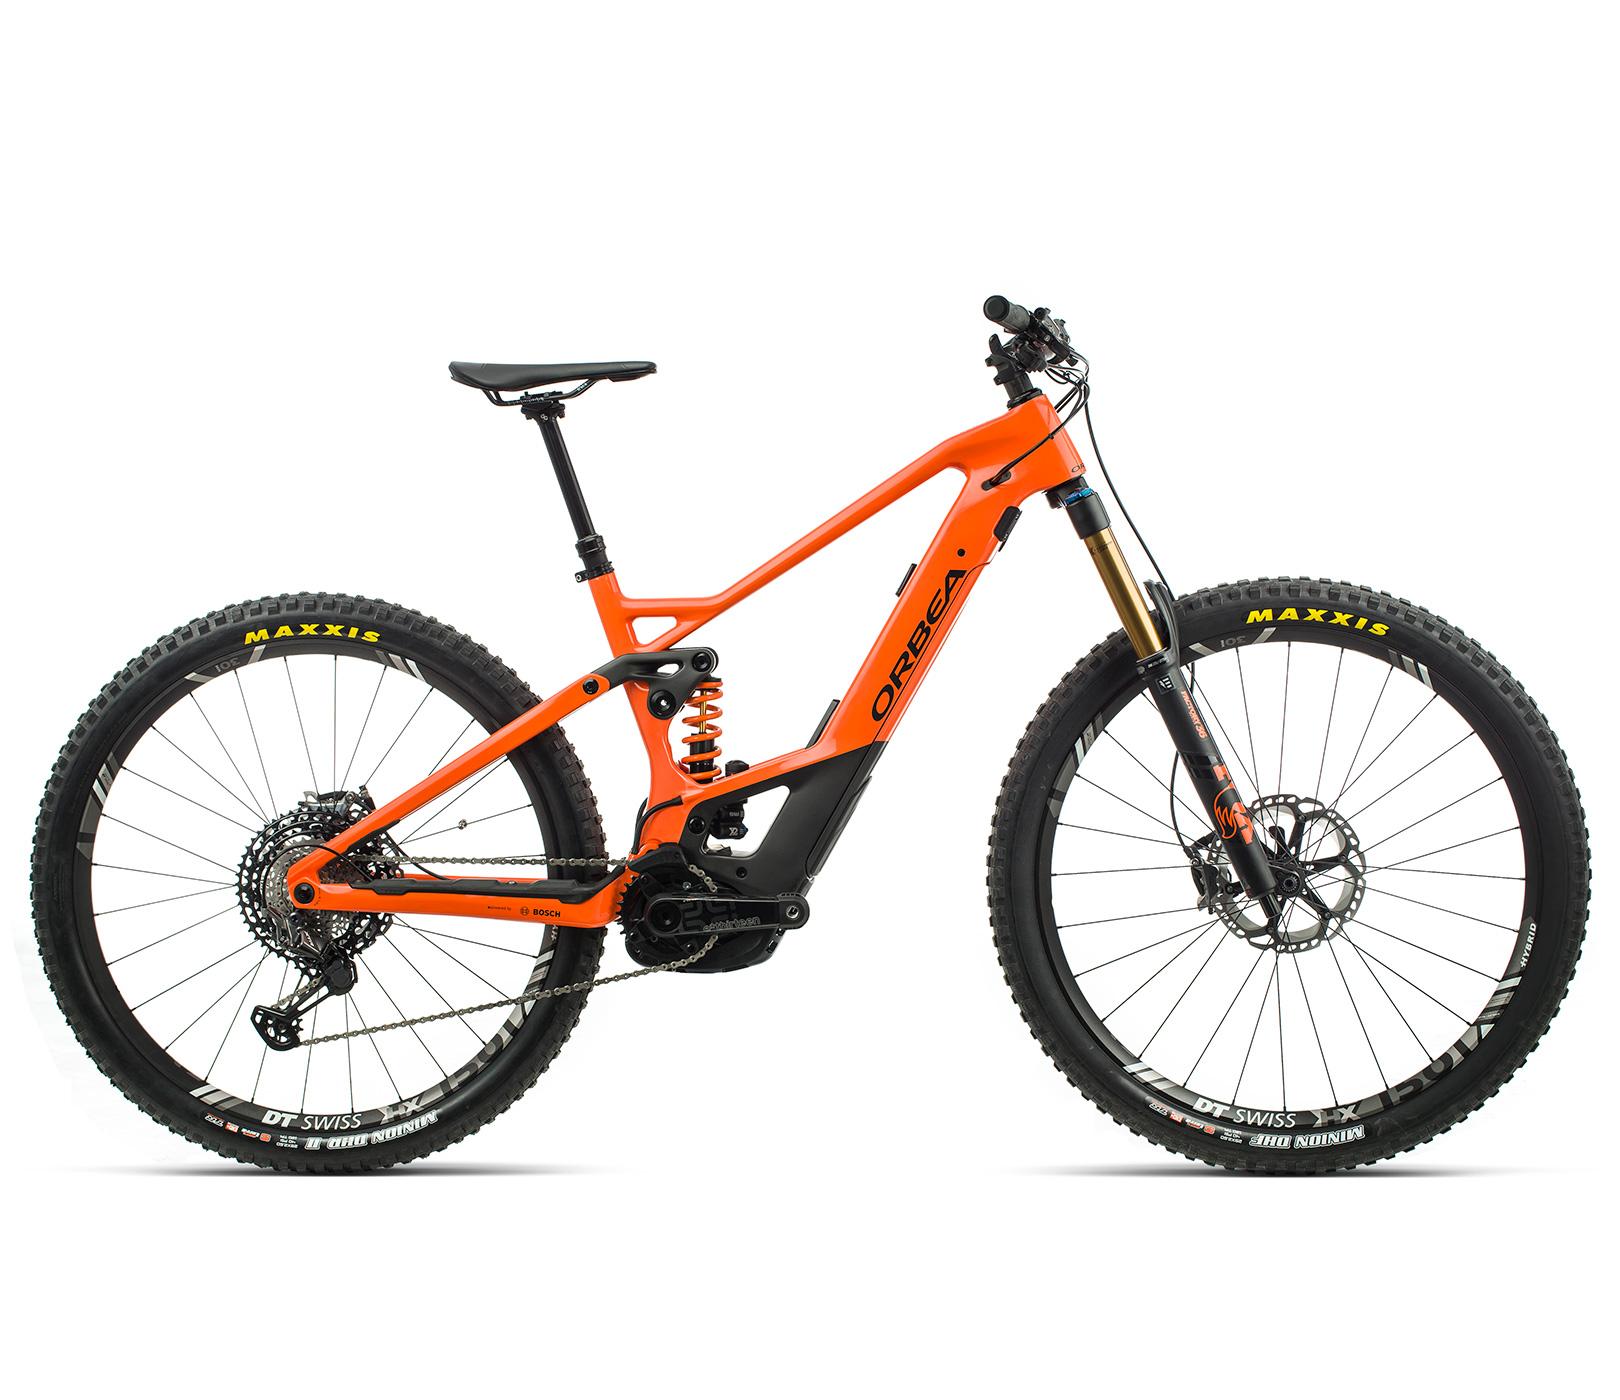 WILD FS M-LTD orange